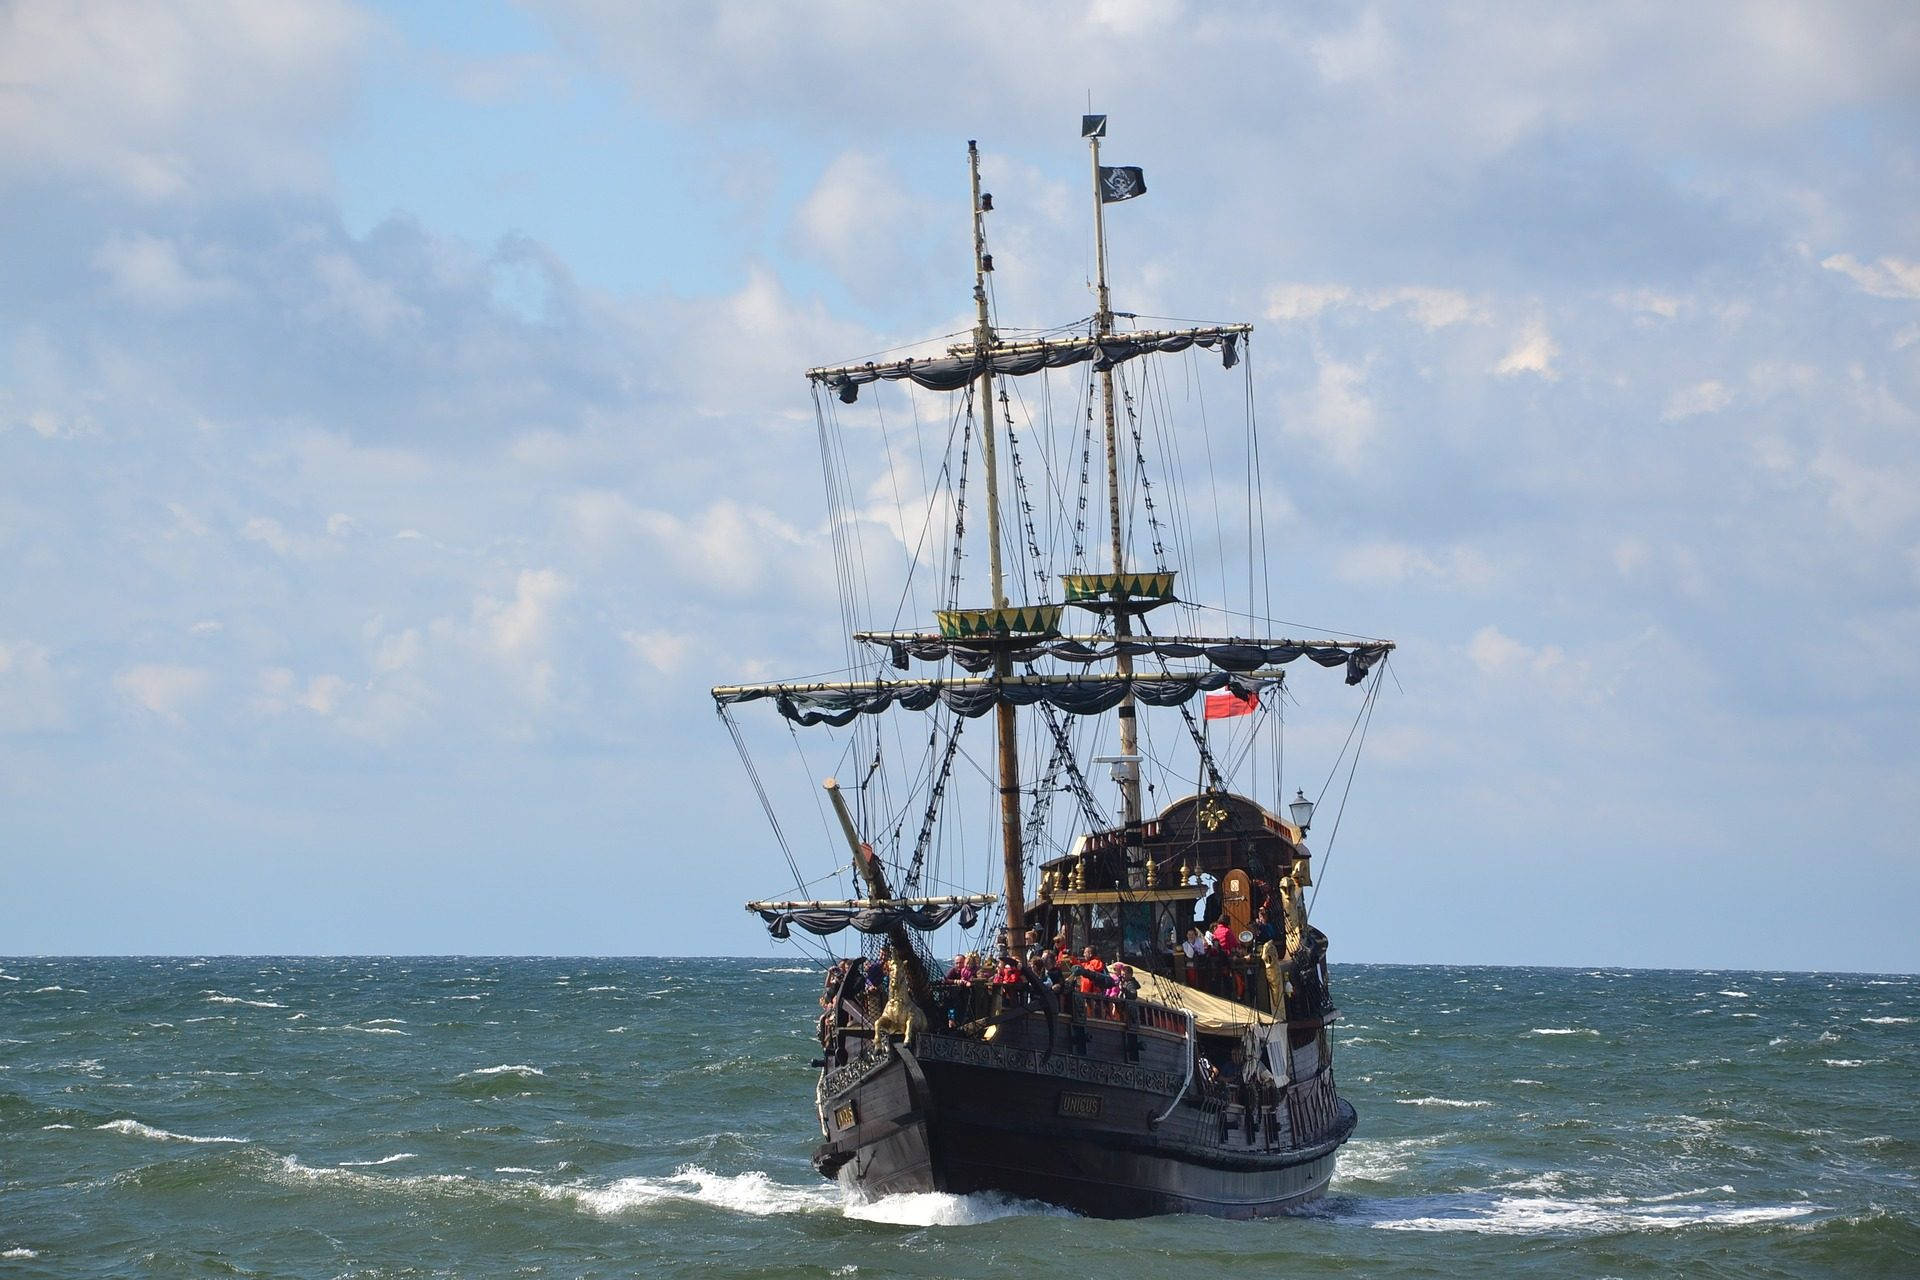 barco, ιστιοφόρο, Πειρατή�βάρκαες, κεριά, embarcación, Θάλασσα - Wallpapers HD - Professor-falken.com